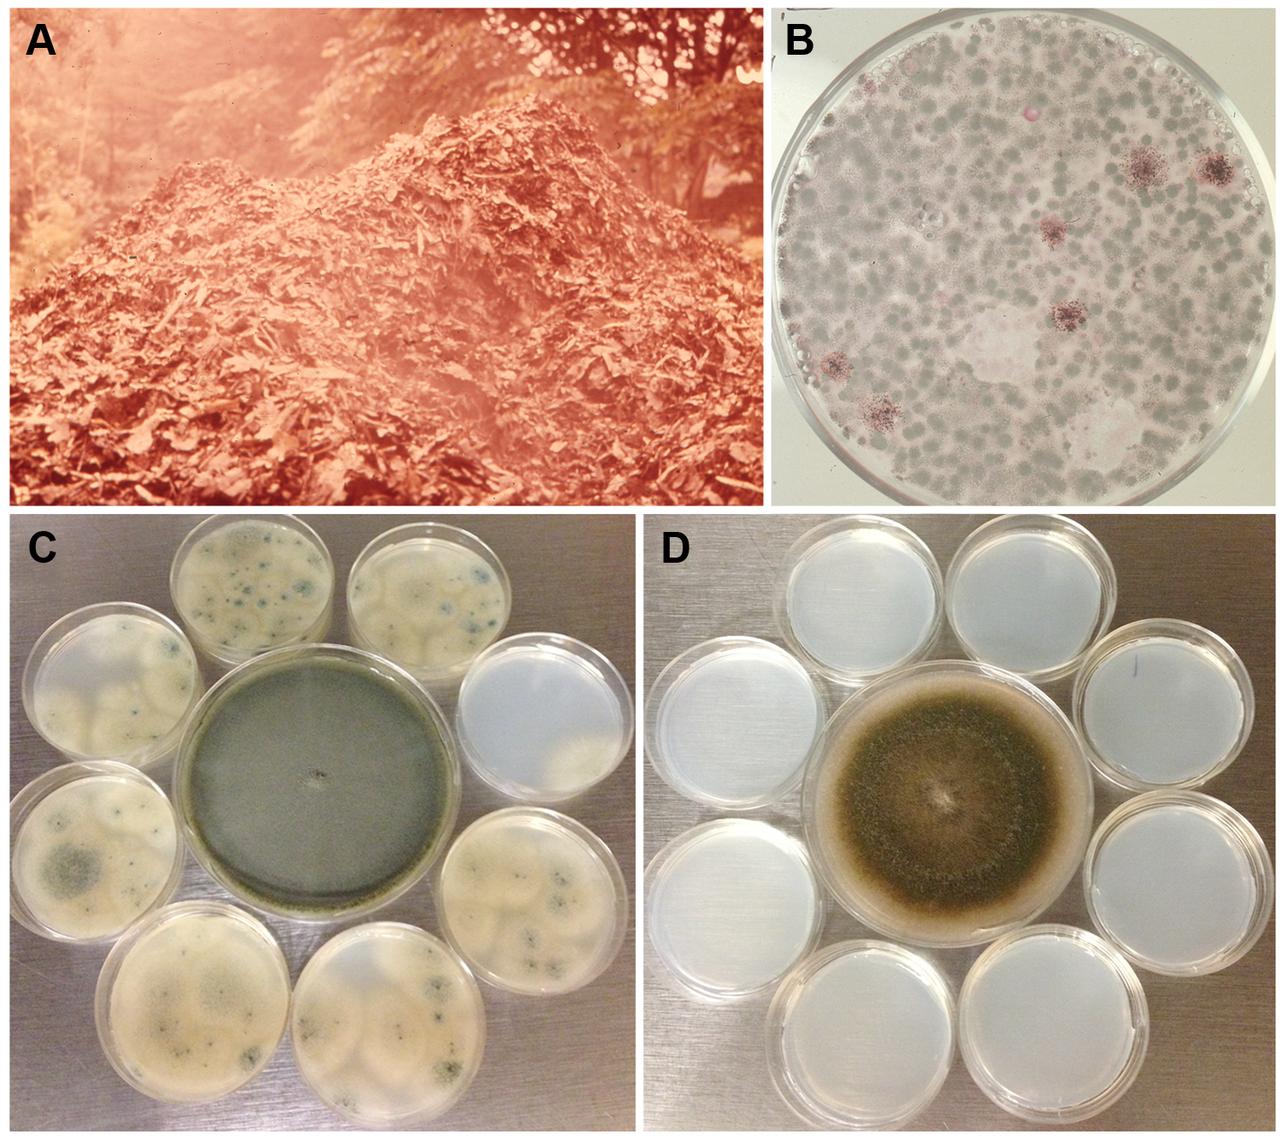 Dispersibility of <i>A. fumigatus</i> conidia.